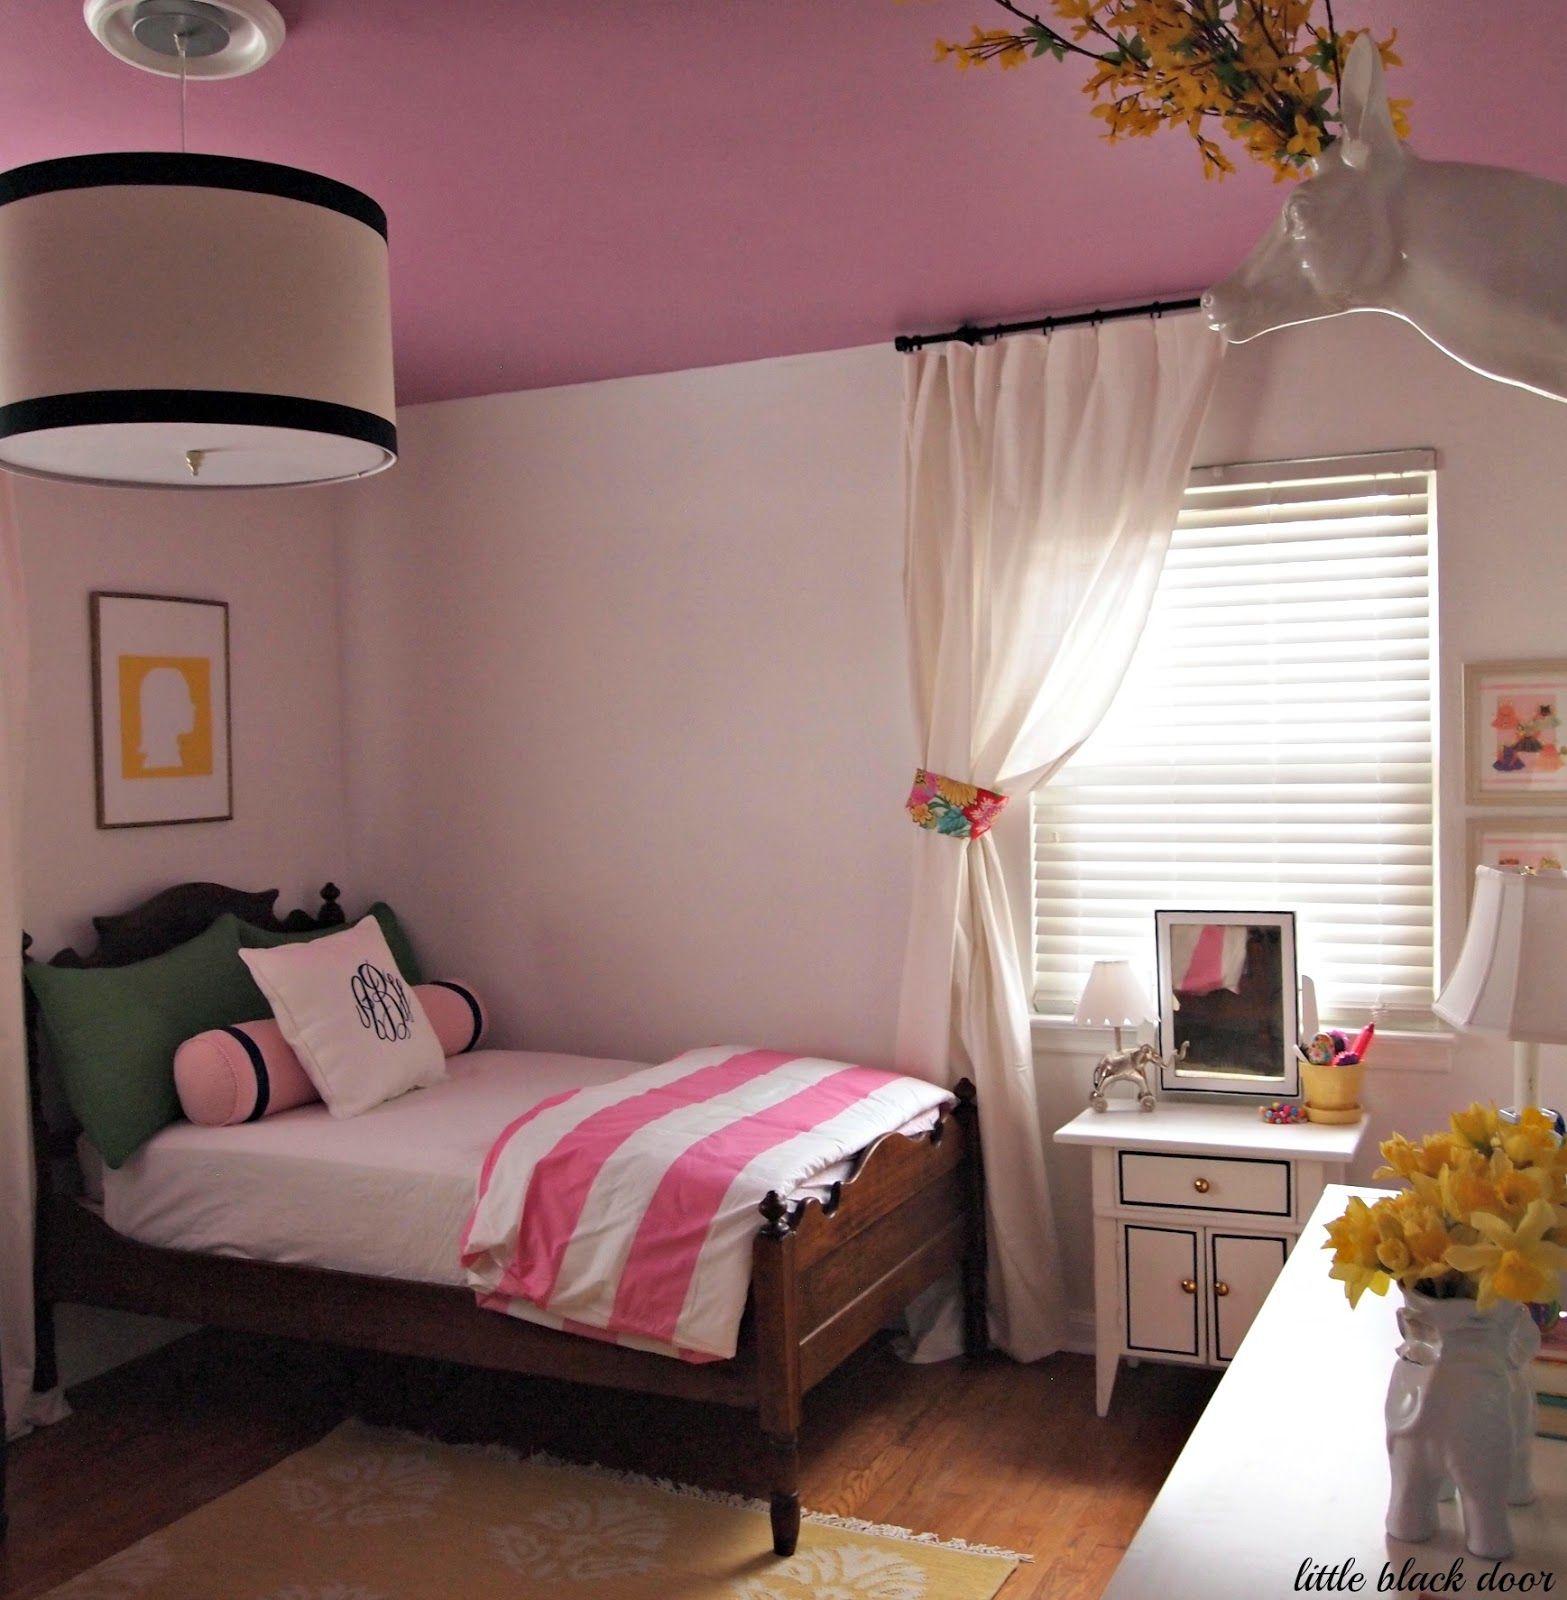 Loft bedroom ideas for teenage girls   Creative Girls Bedroom Ideas for Your Child and Teenager  Bedrooms